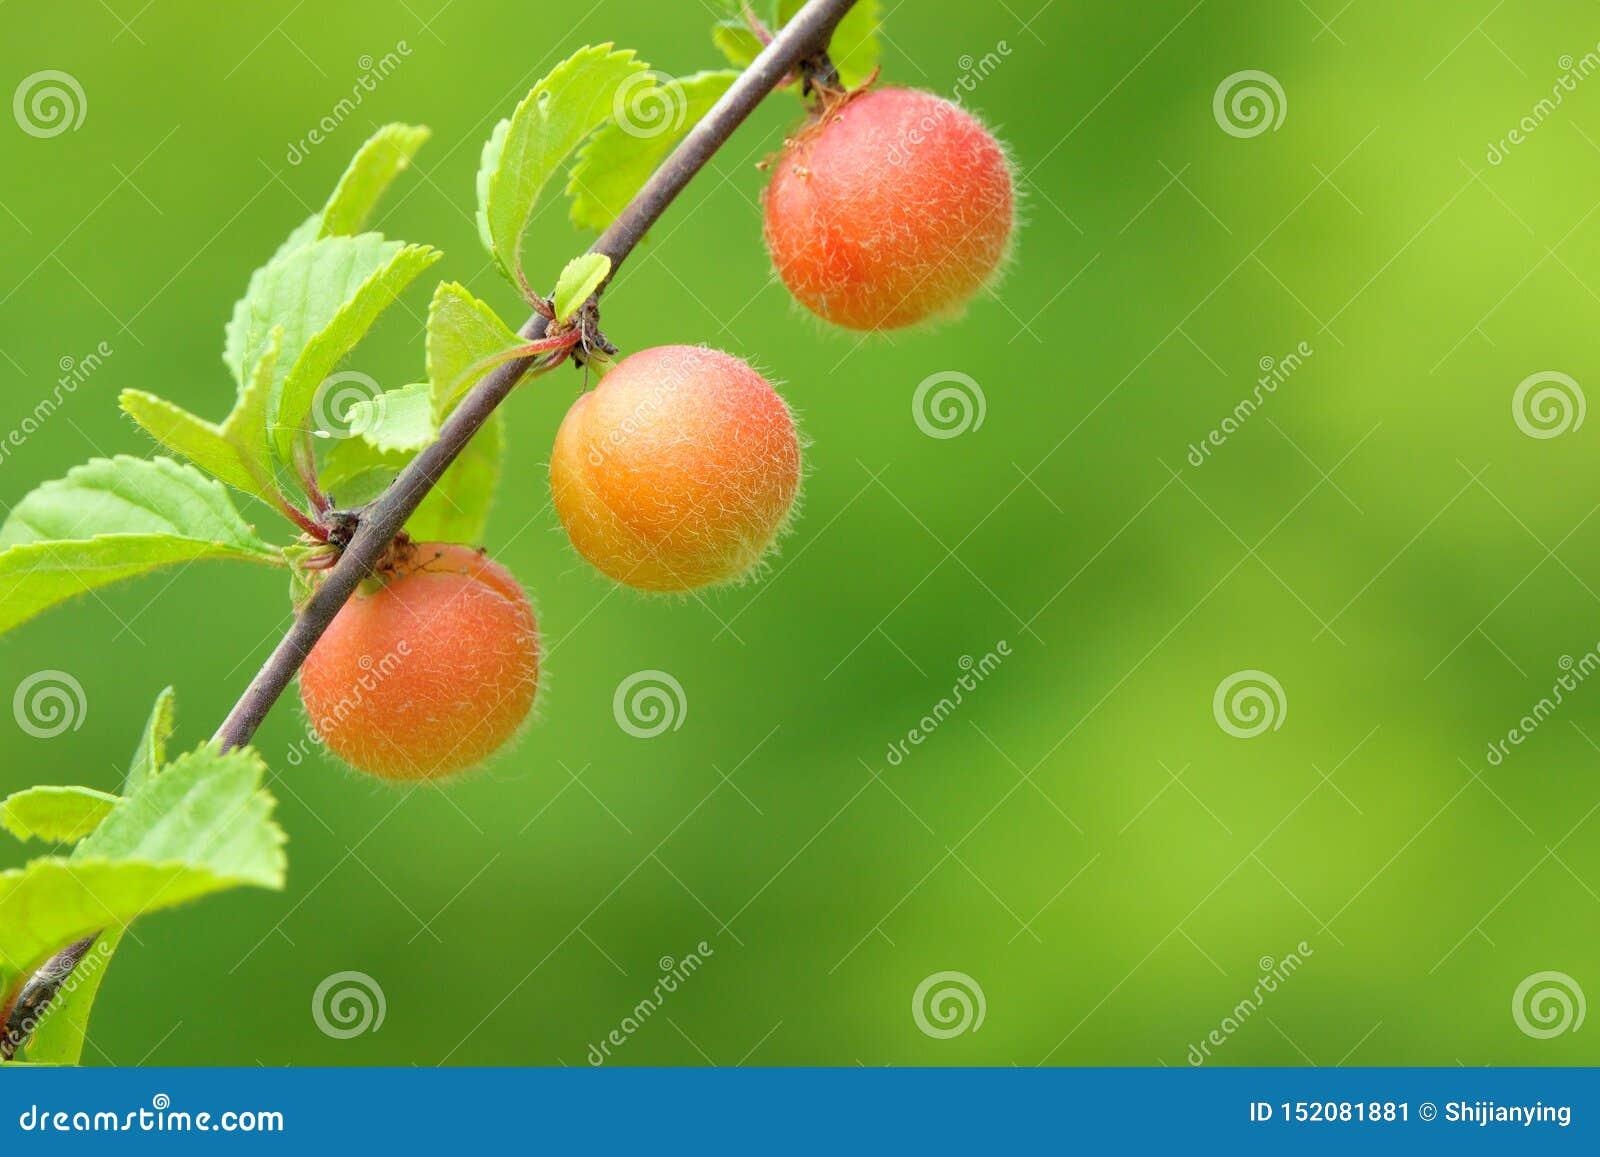 Fruits Of Flowering Plum Stock Image Image Of Fruitage 152081881